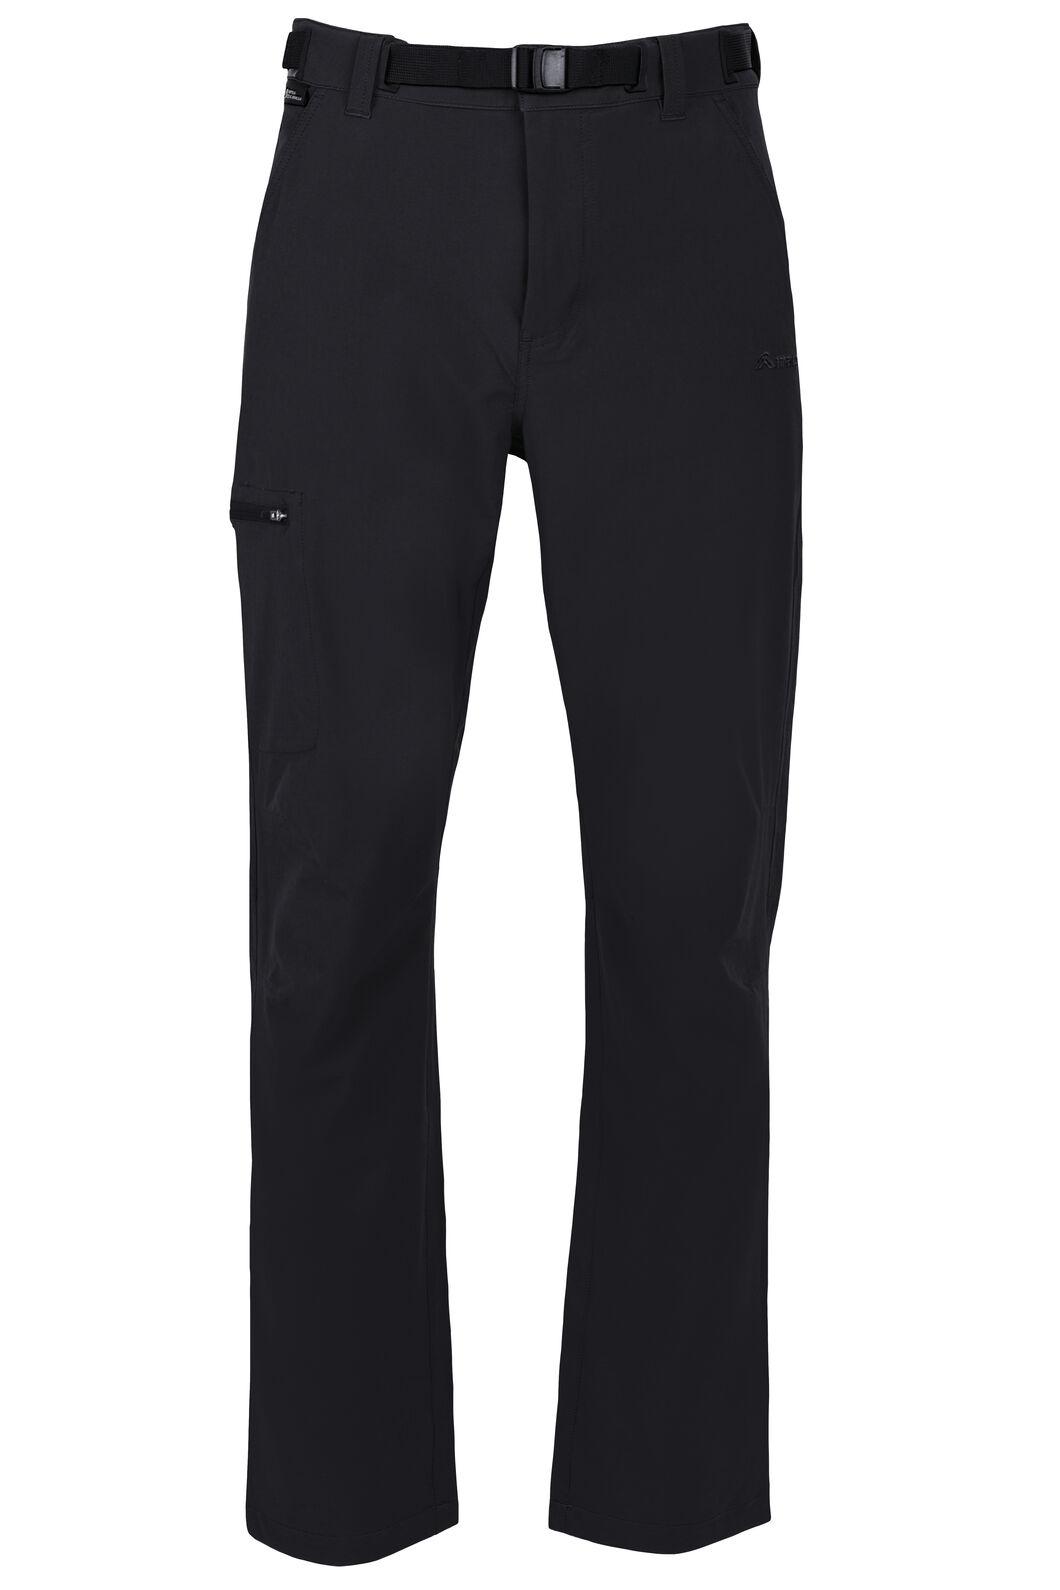 Macpac Trekker Pertex® Equilibrium Softshell Pants - Men's, Black, hi-res